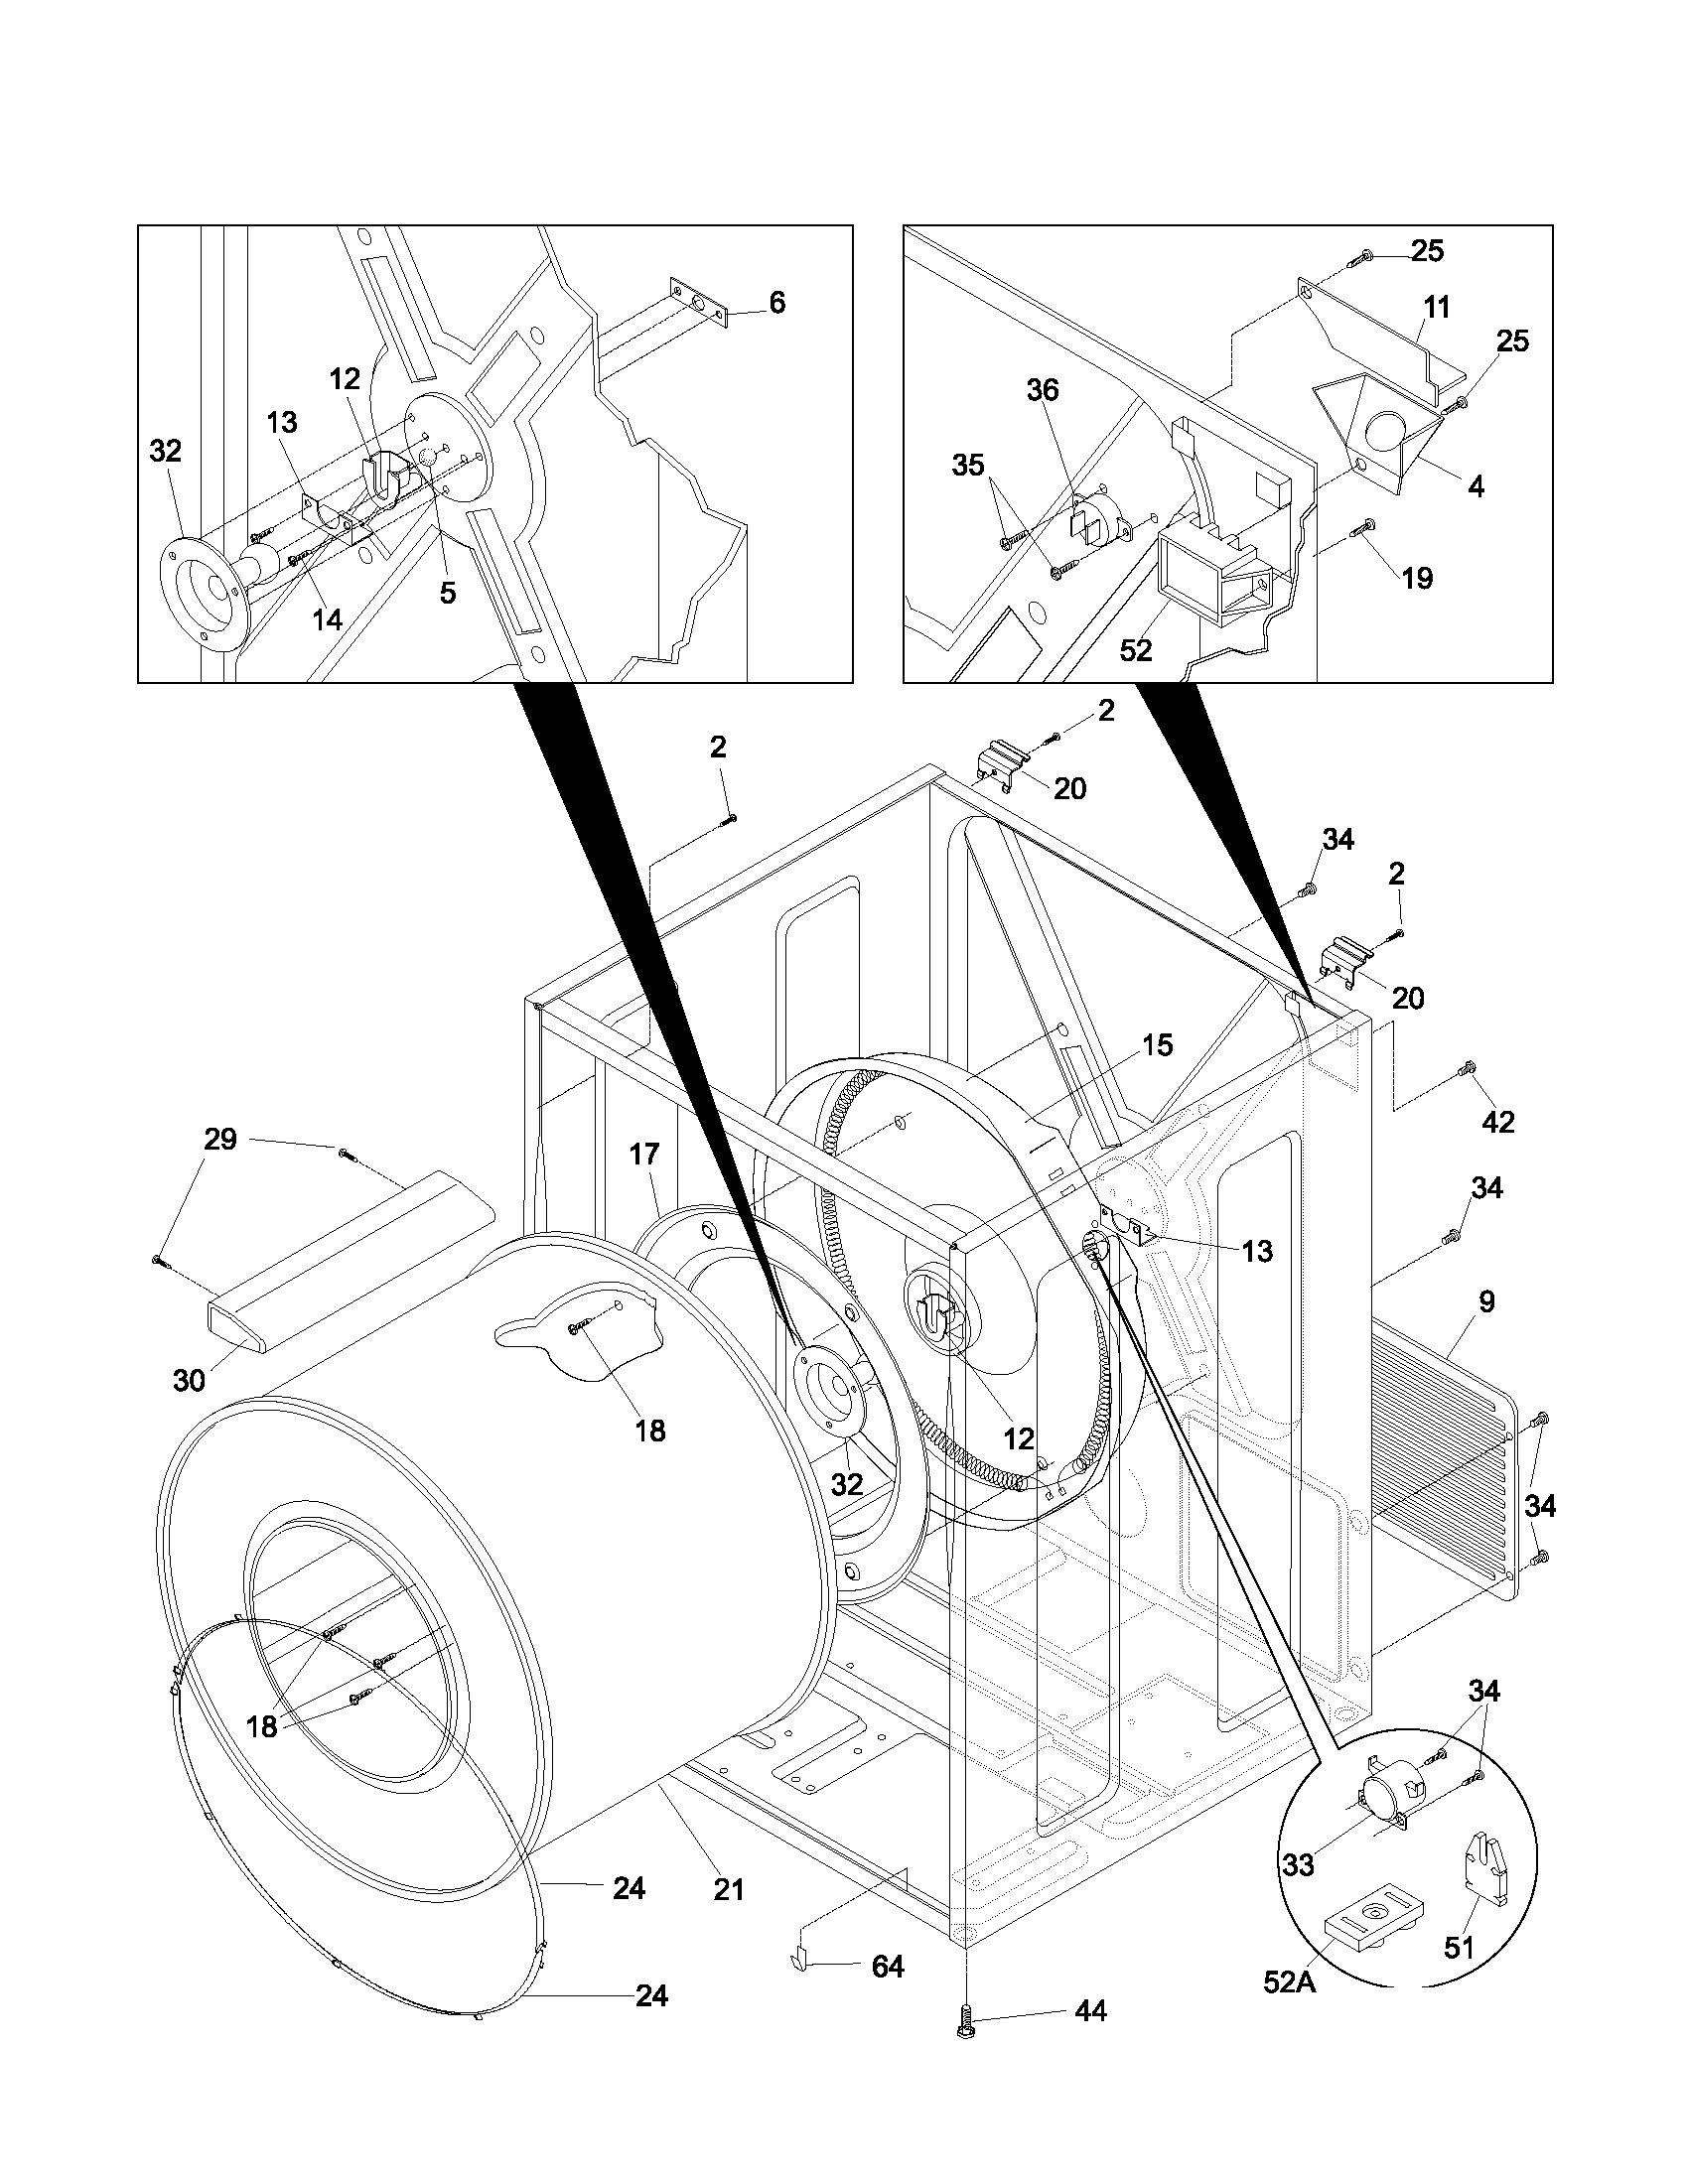 Wiring diagram for jet boat yhgfdmuor